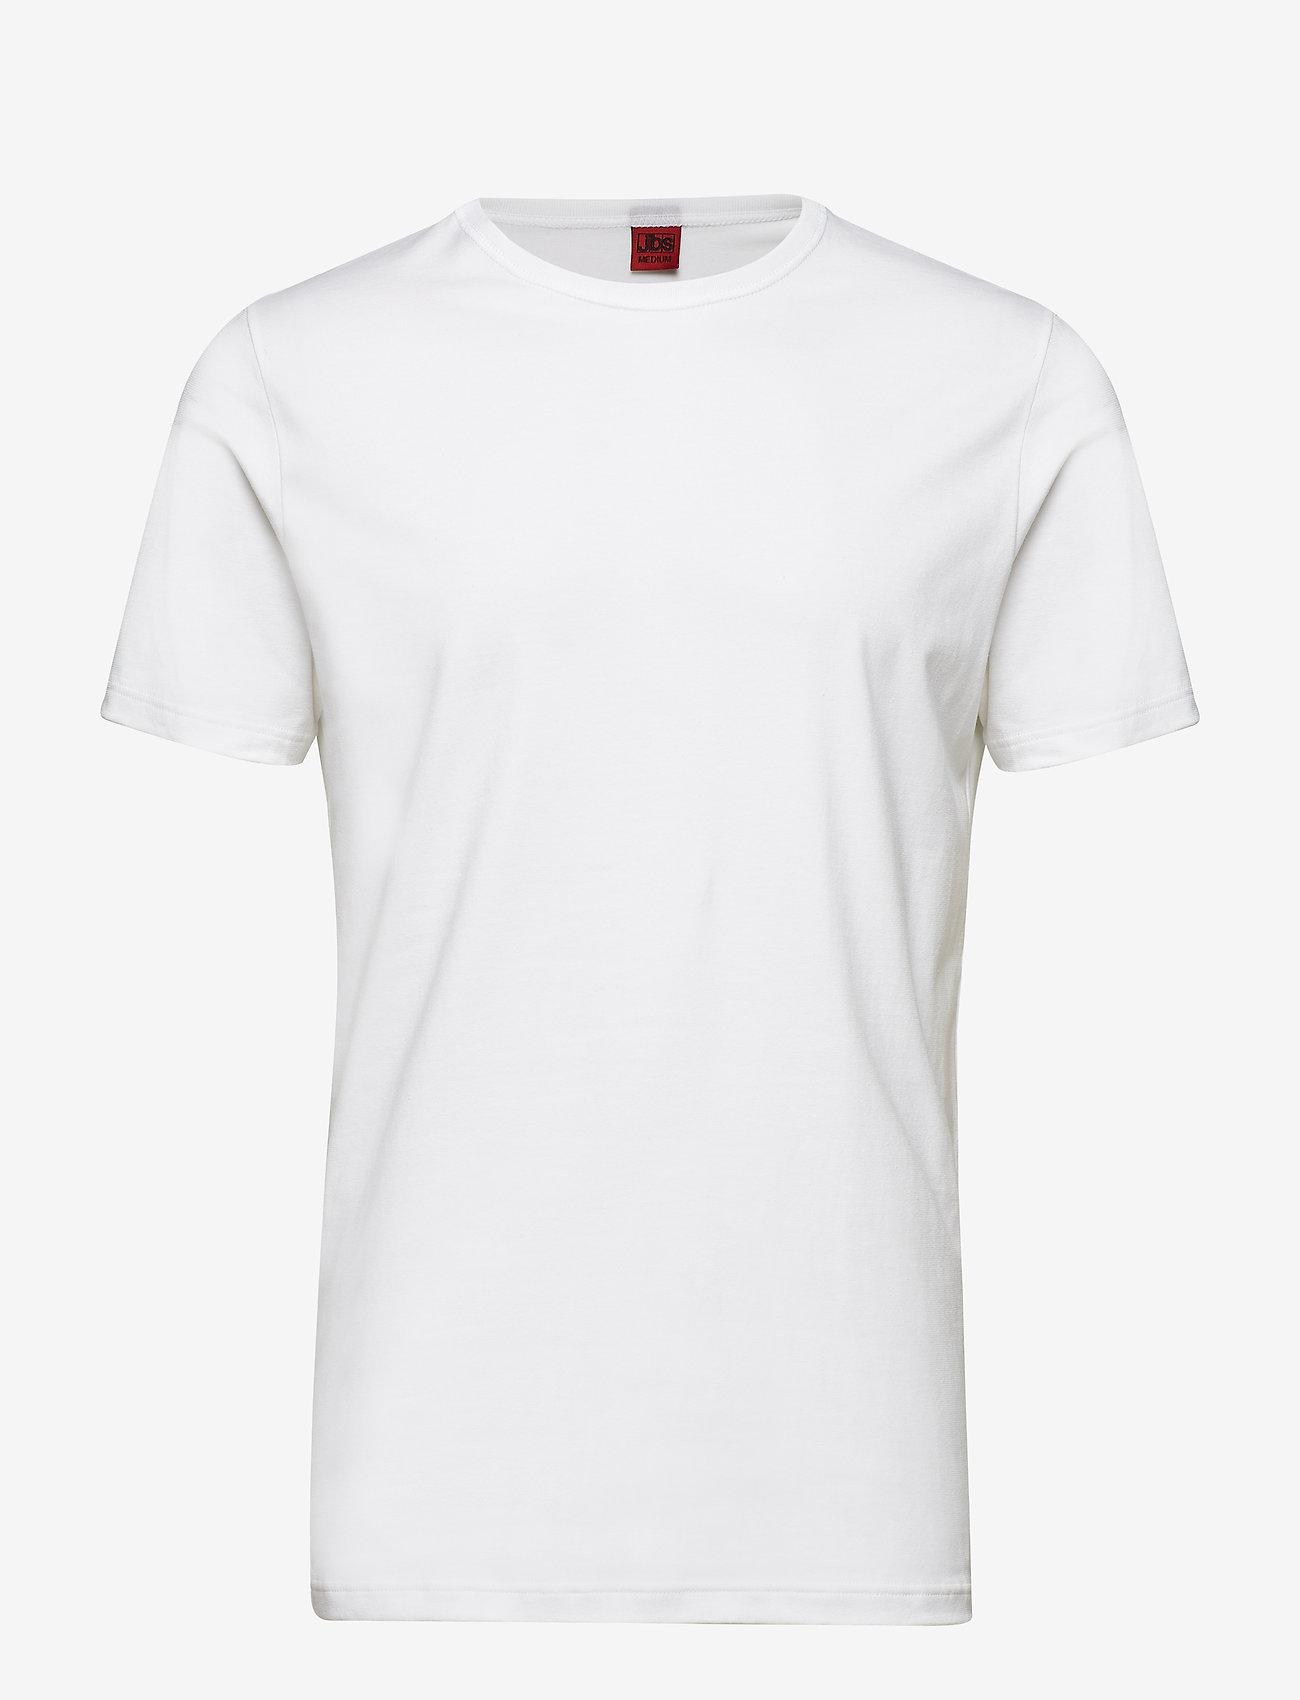 JBS - JBS t-shirt O-neck - basic t-shirts - white